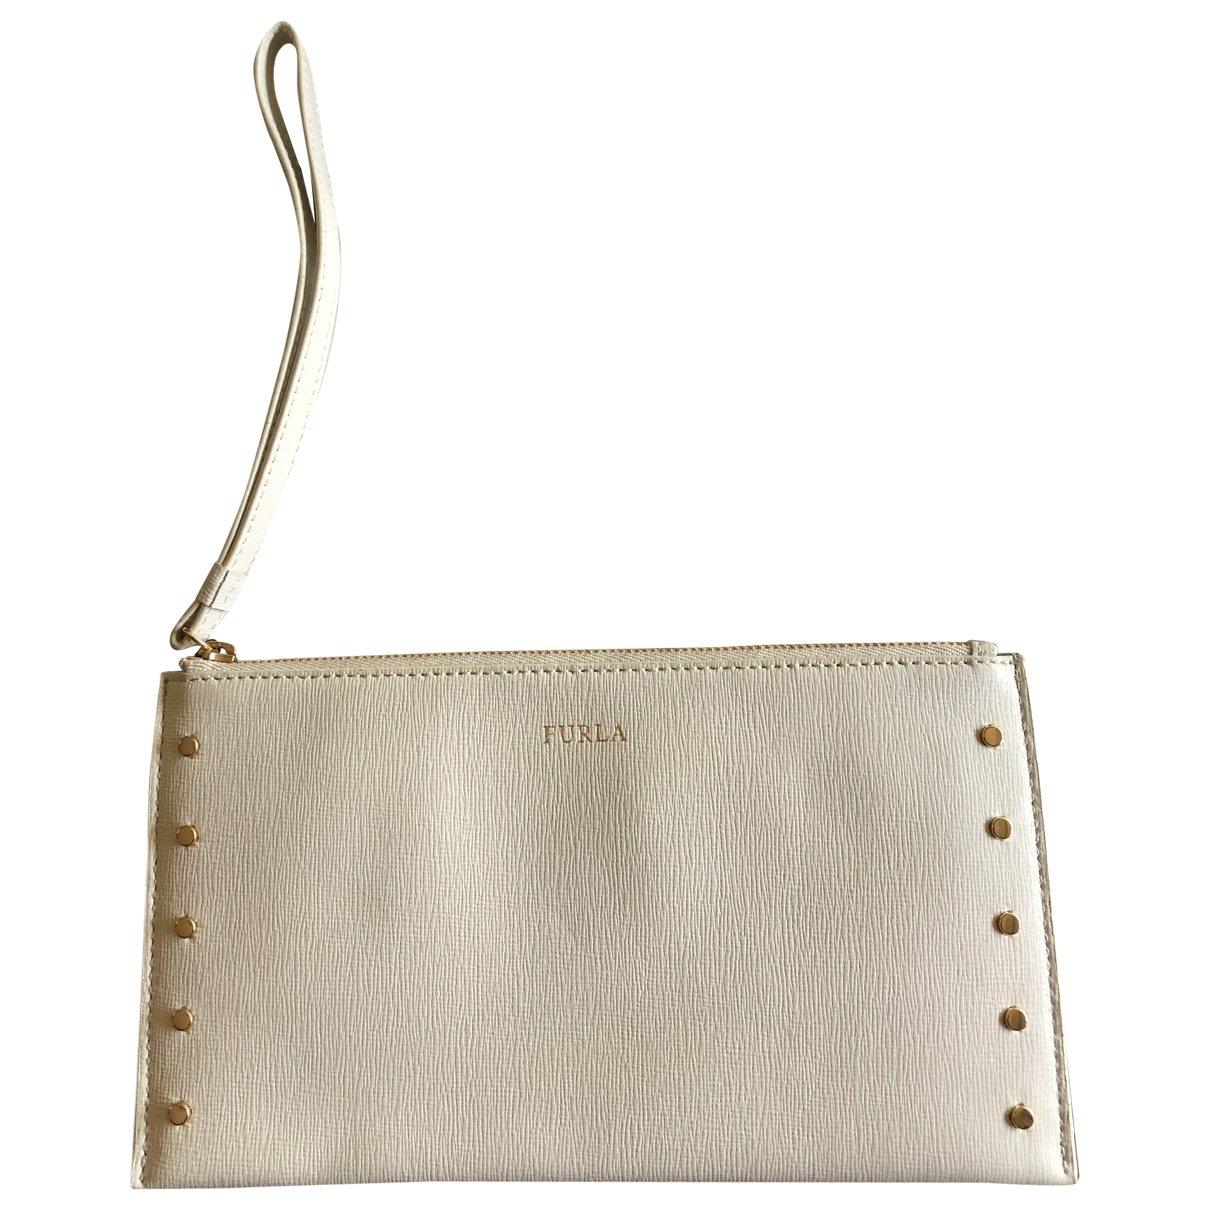 Furla \N White Leather Clutch bag for Women \N